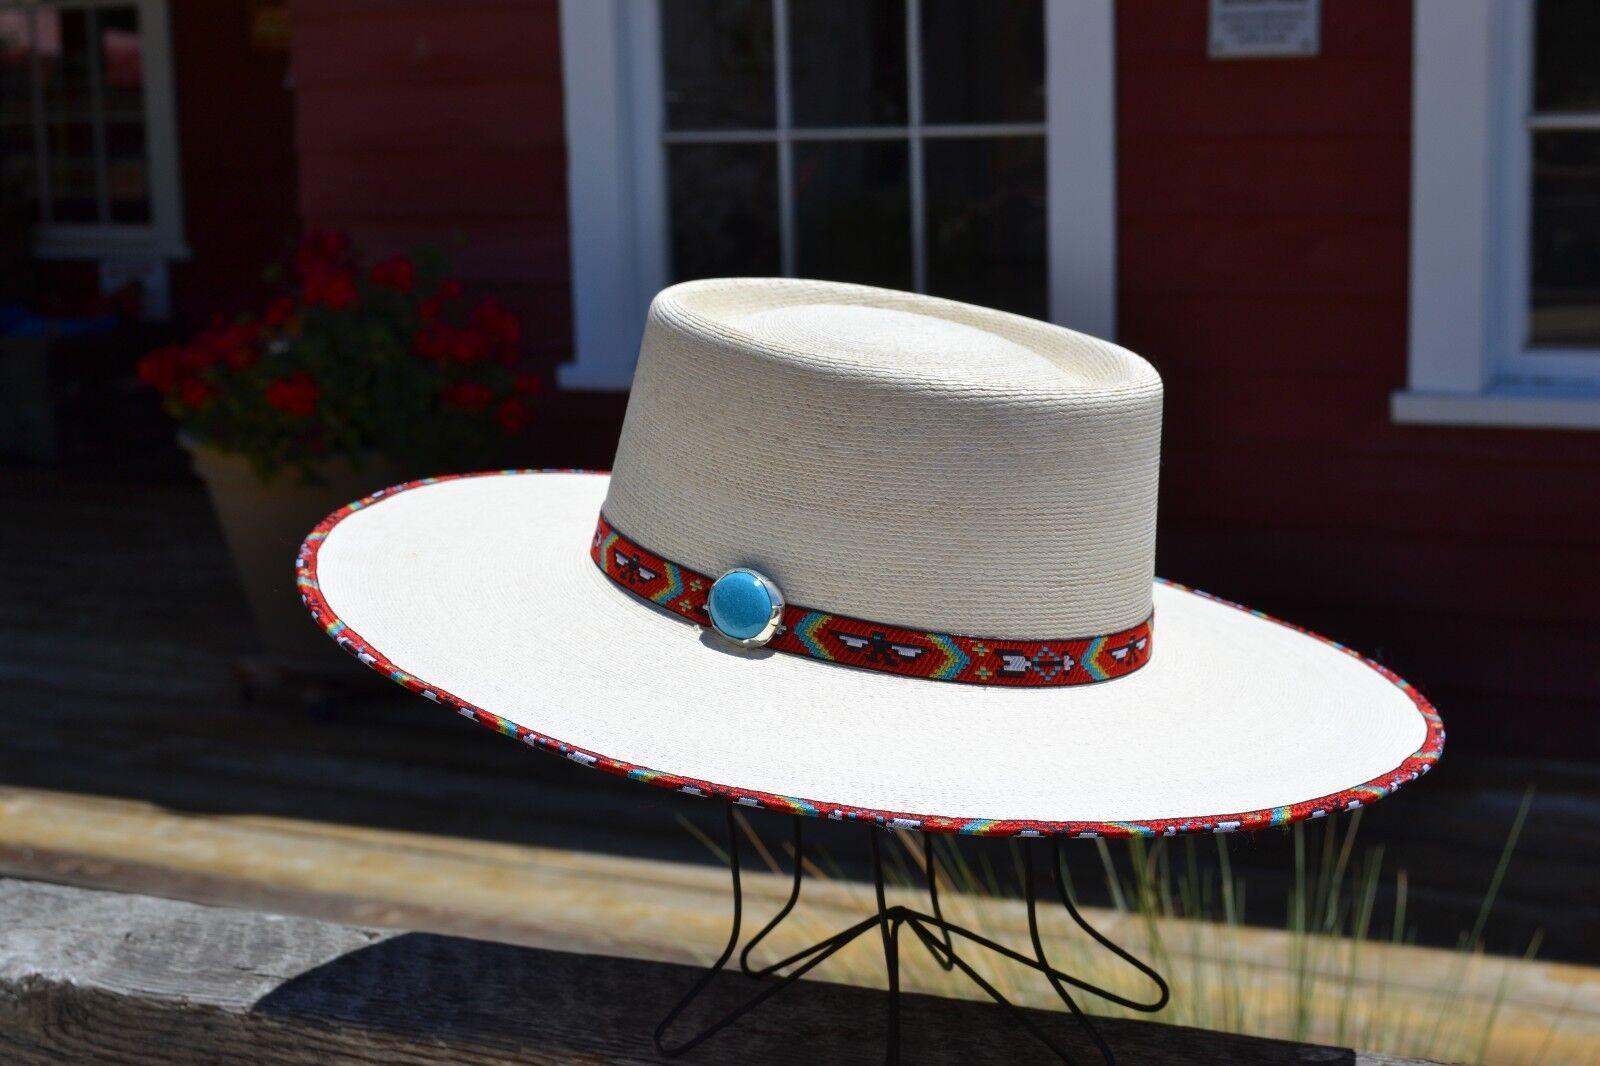 Atwood Hat Company - Santa Fe Nevada 15X Palma Balestra Cowboy Vaquero Cowboy Balestra - 10.2cm 64a8a9